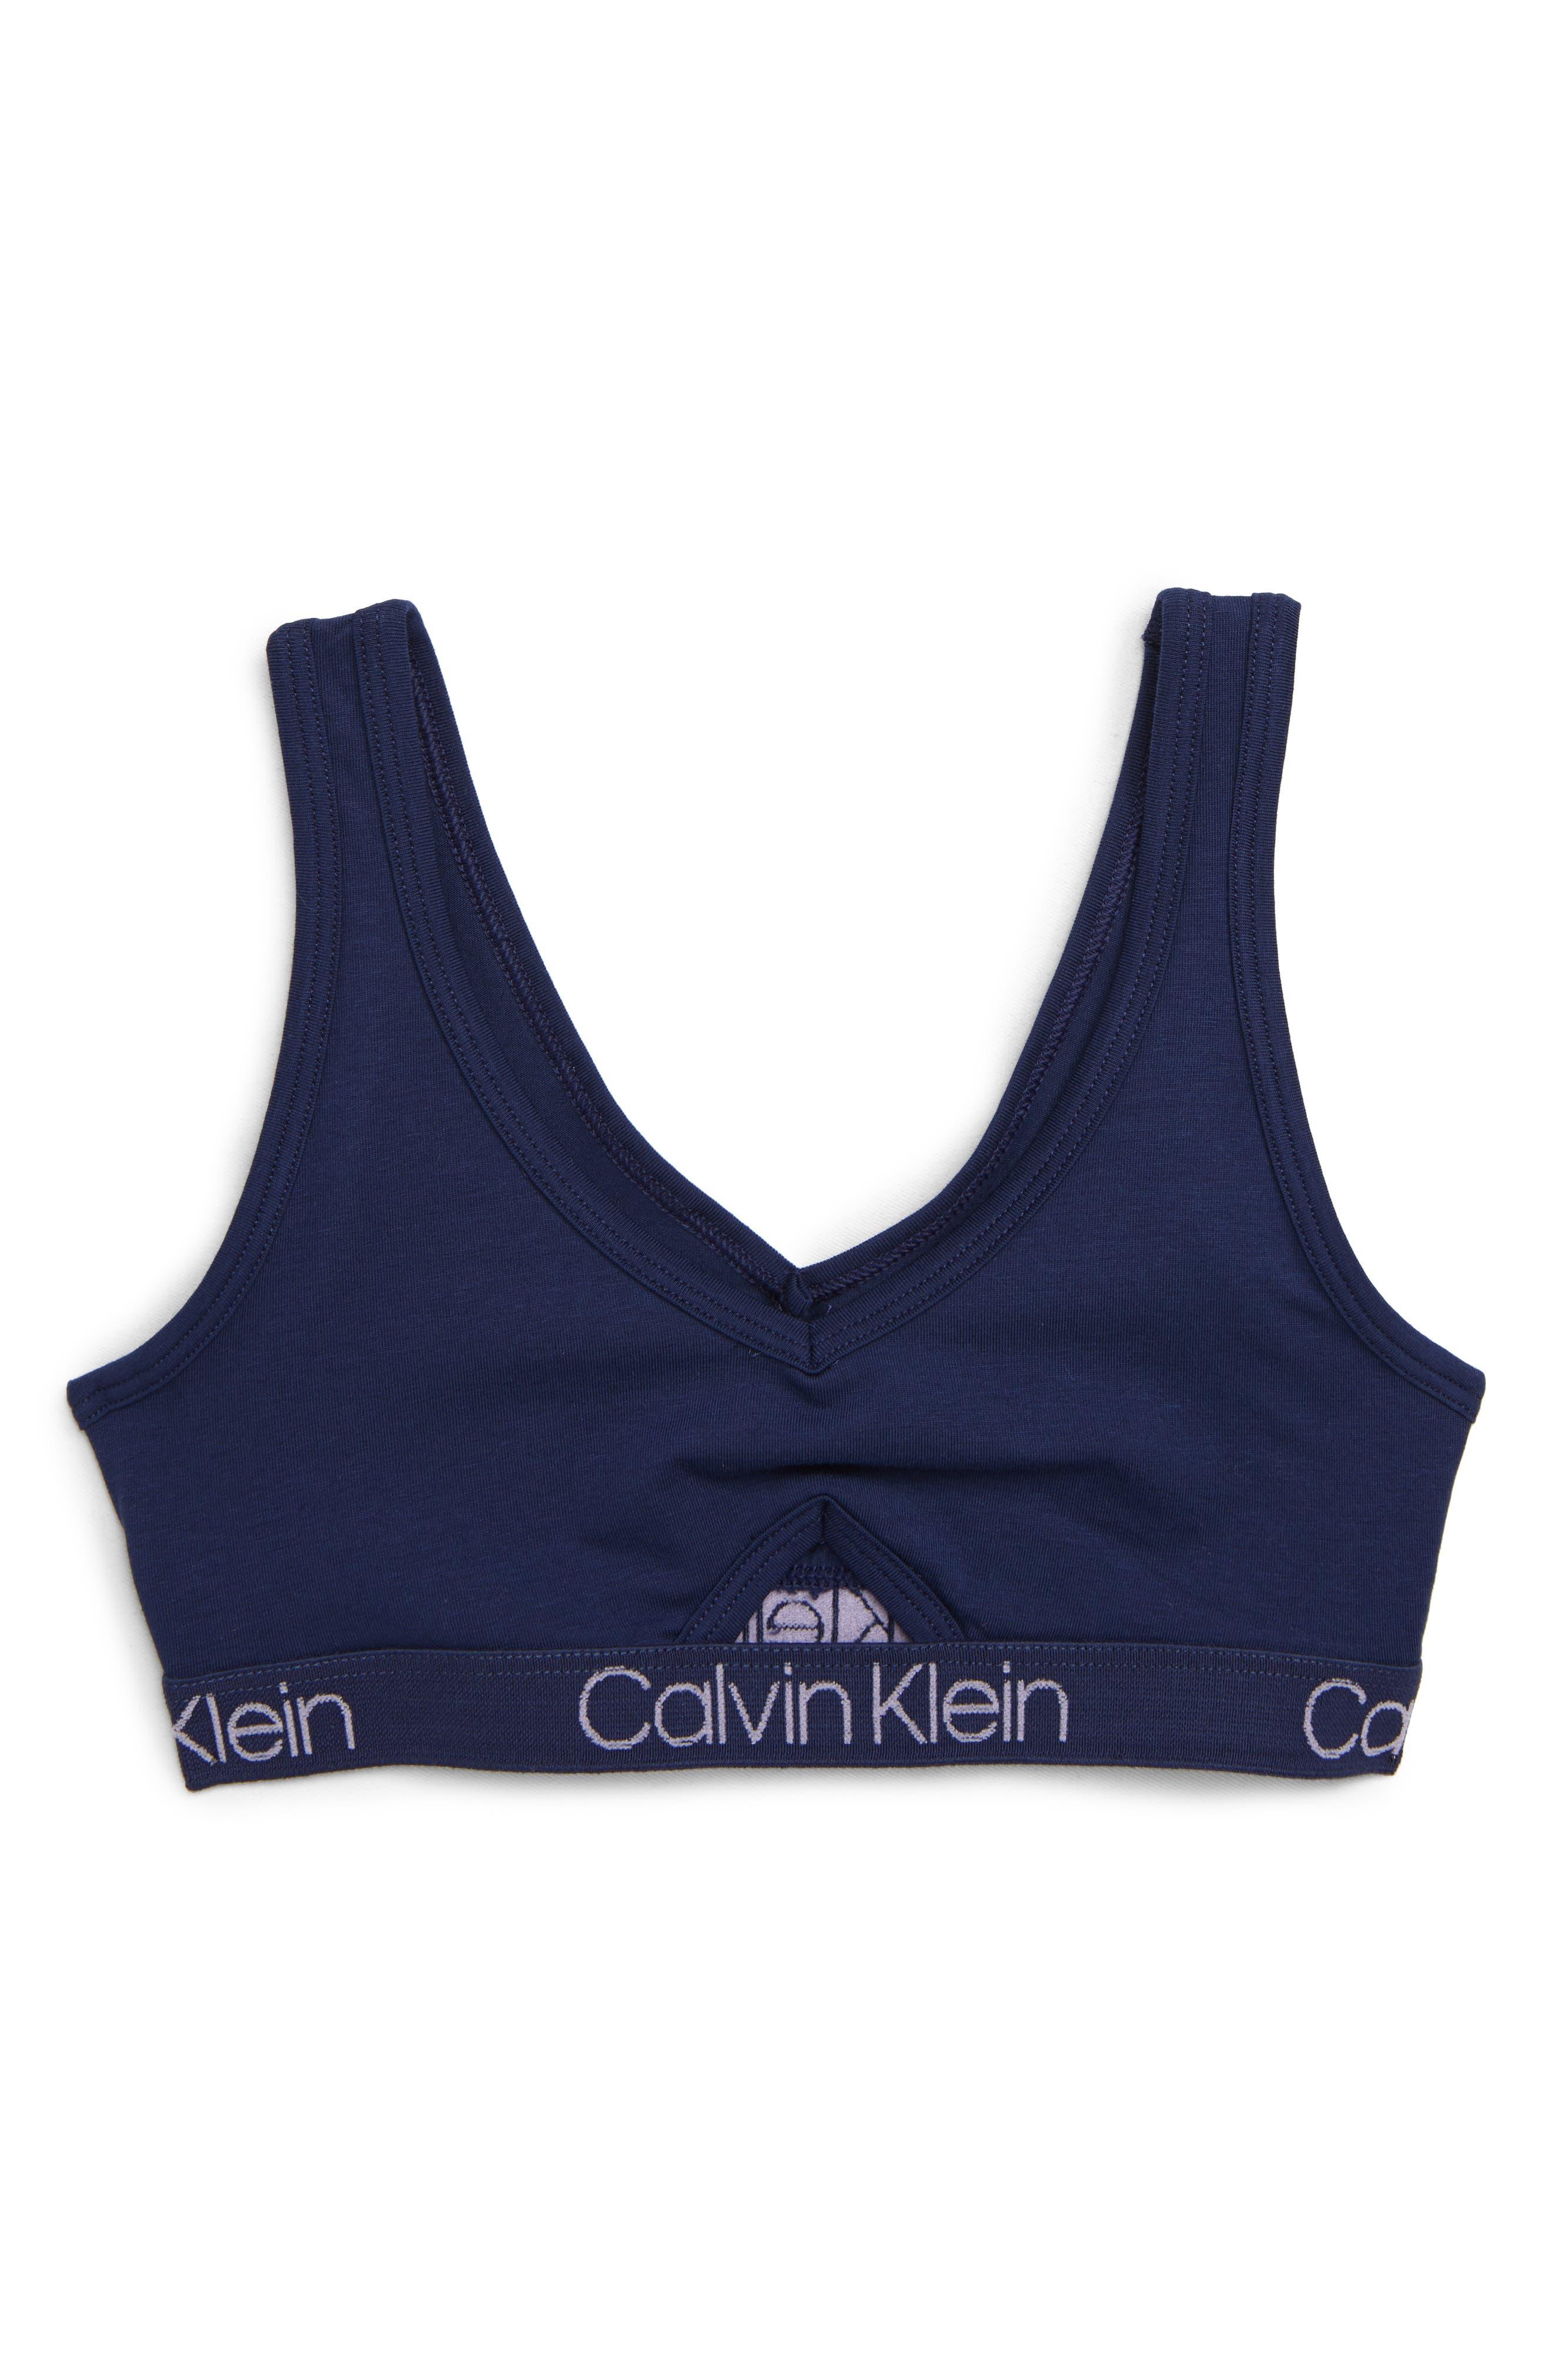 150d8e1628a9ae Girls  Calvin Klein Clothing and Accessories